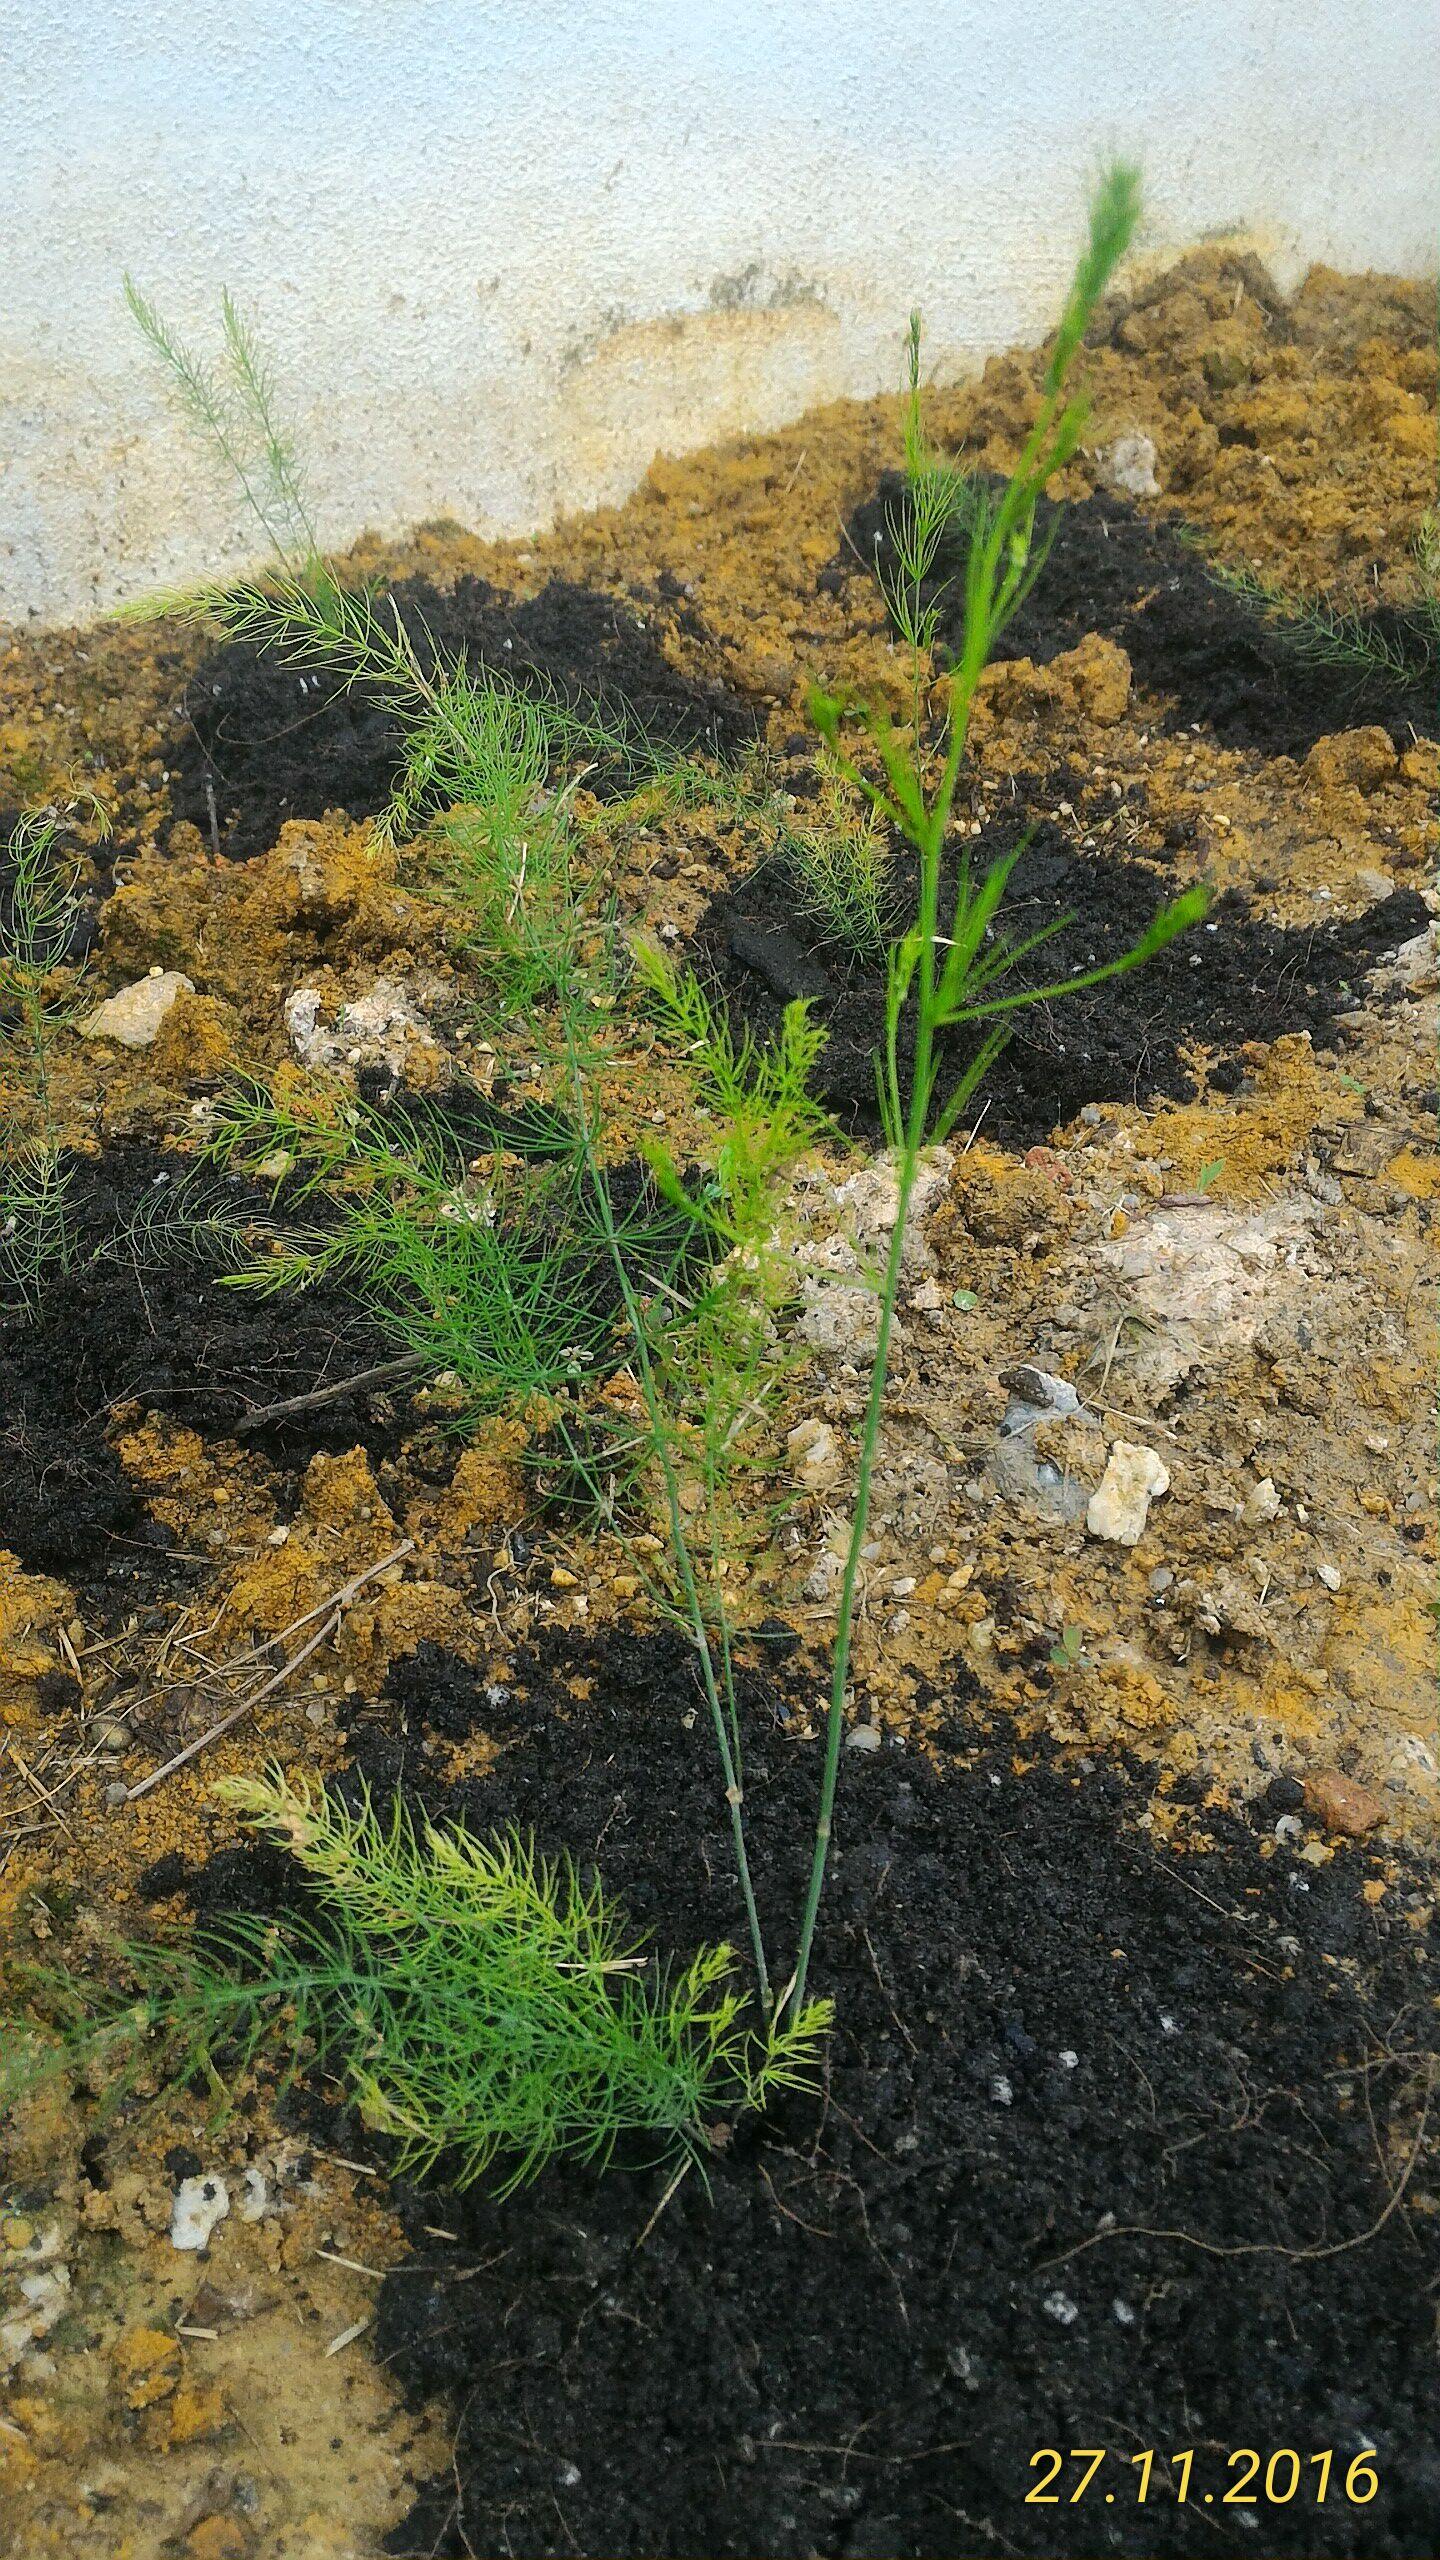 Anak anak pokok asparagus yang baru berumur sebulan lebih.